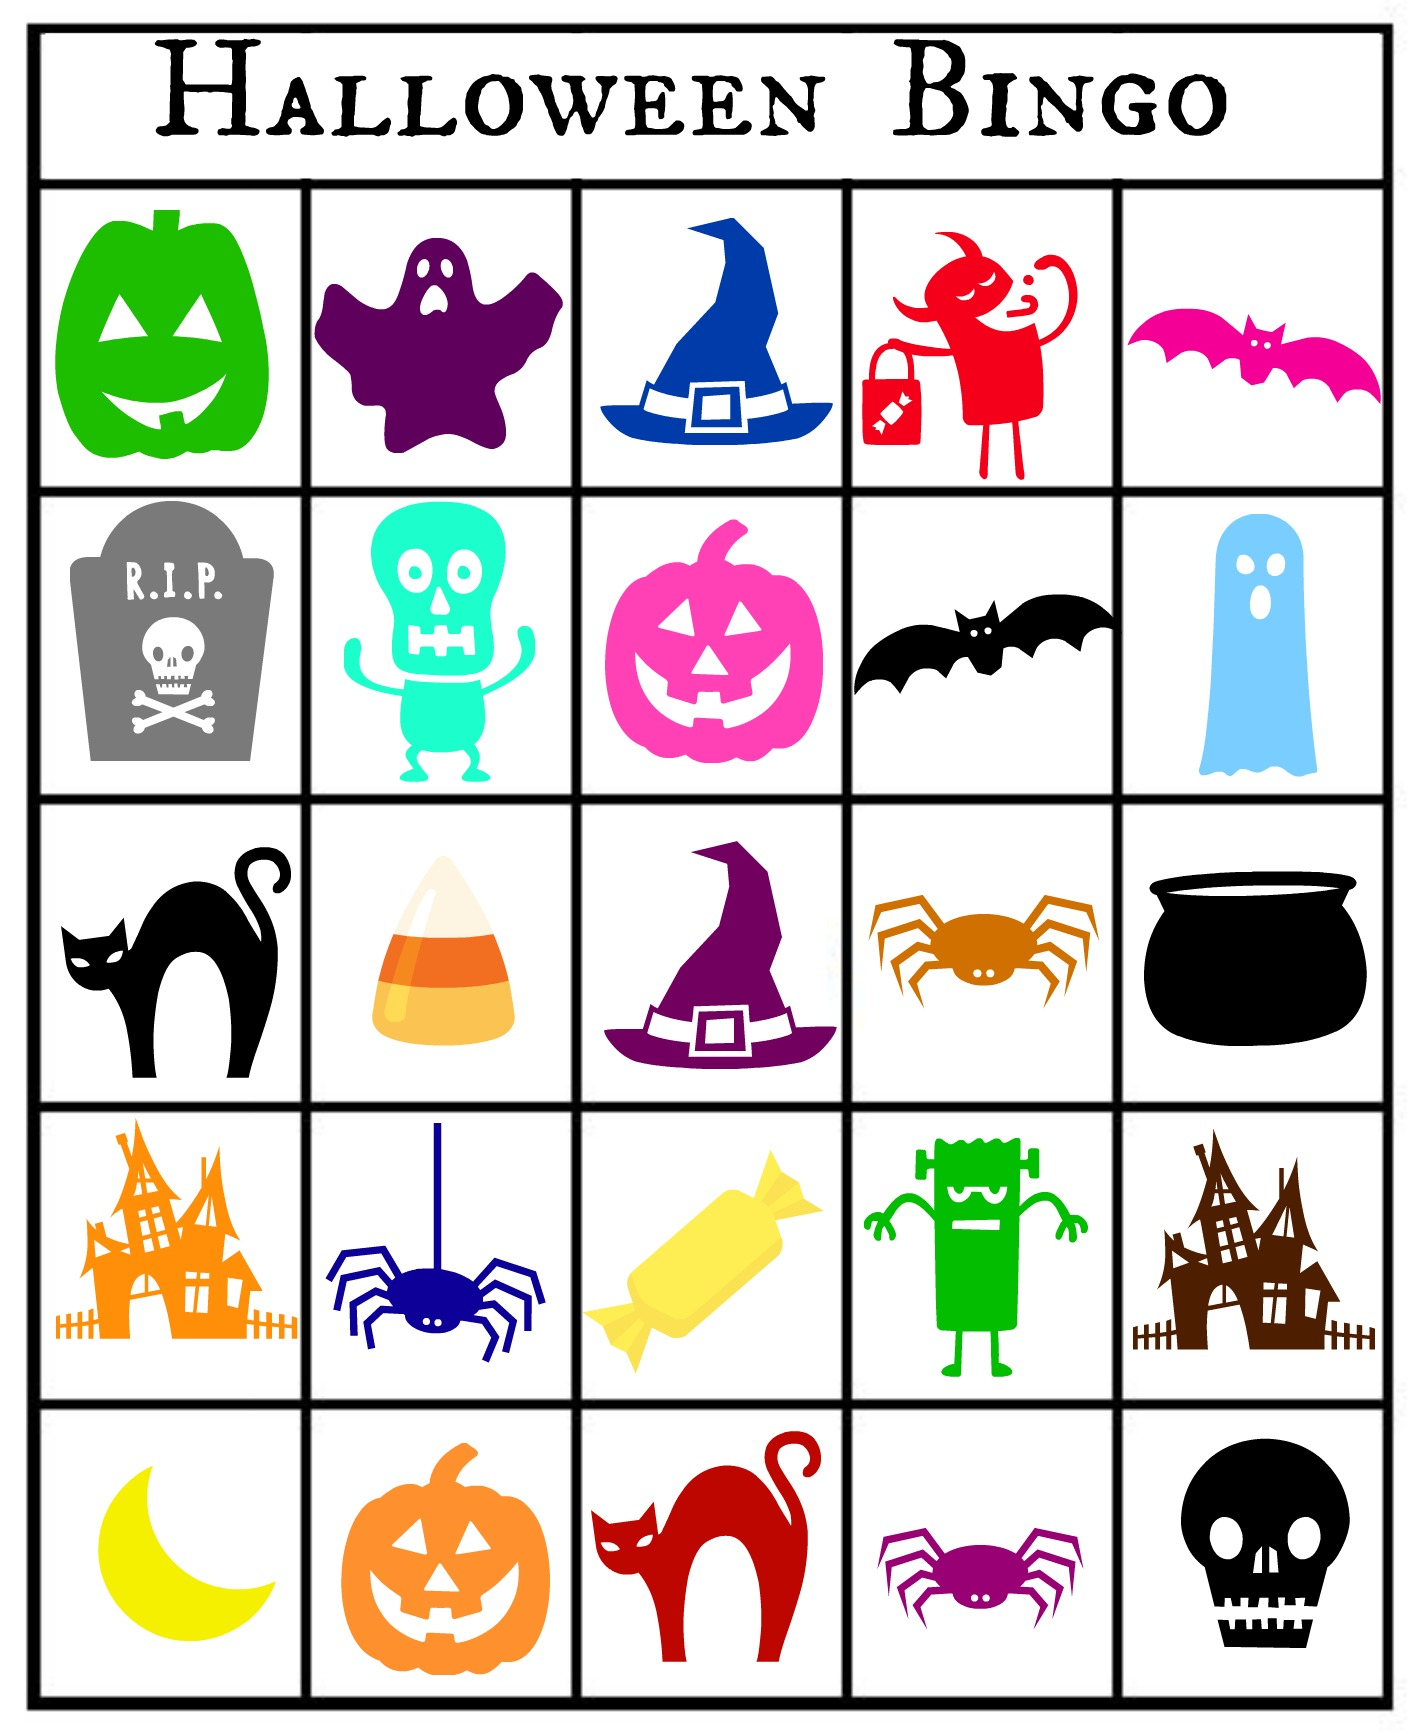 Free Printable Halloween Bingo Cards With Pictures.Free Printable Halloween Themed Bingo Cards